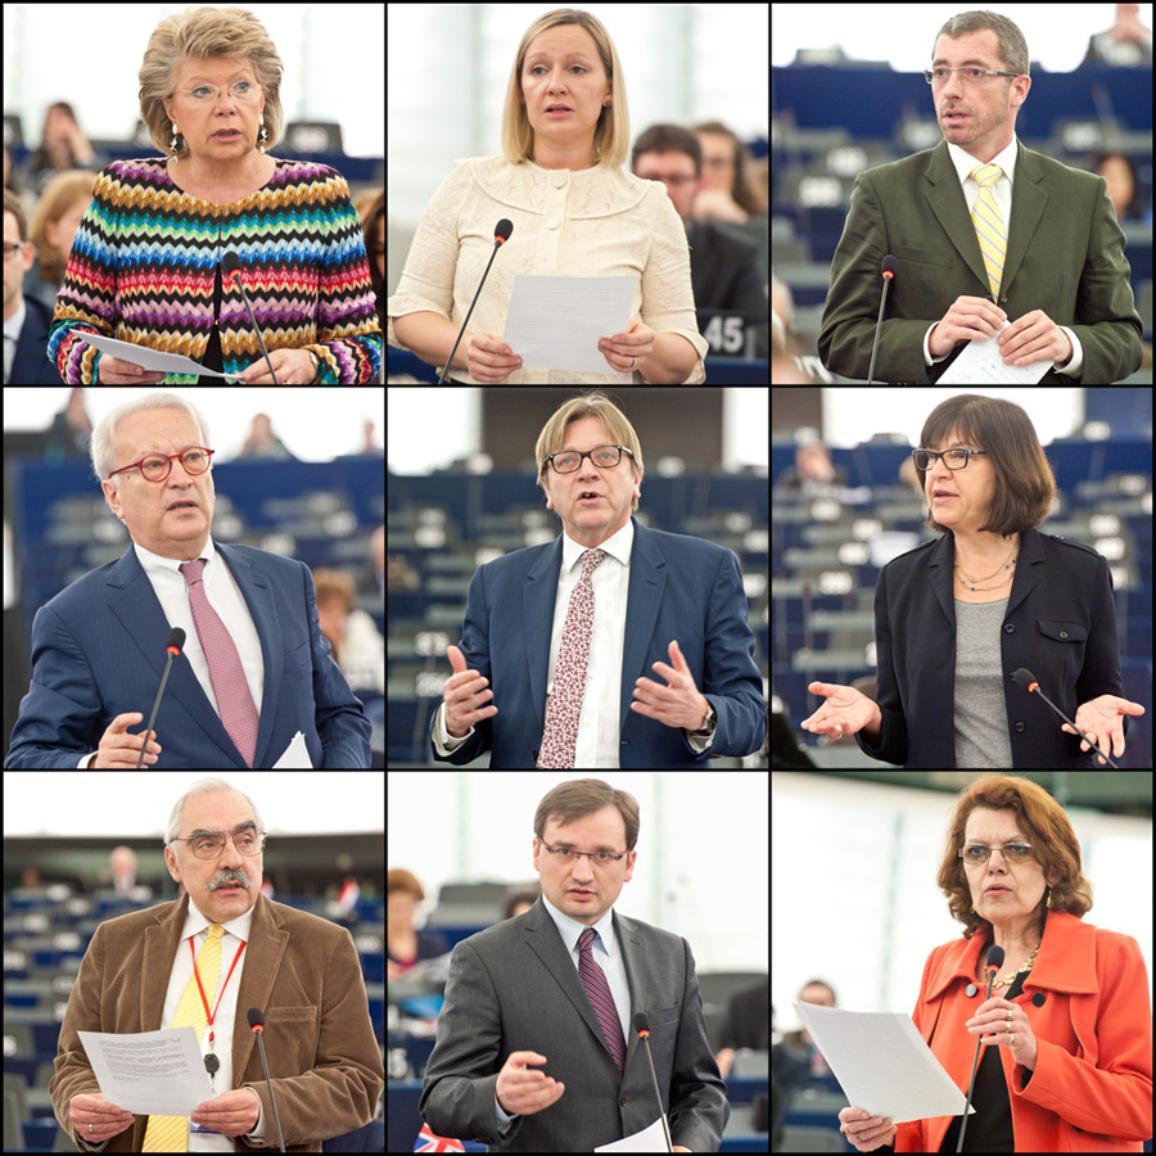 Od lewej do prawej: Viviane Reding, Lucinda Creighton, Frank Engel (EPP), Hannes Swoboda (S&D), Guy Verhofstadt (ALDE), Rebecca Harms (Greens/EFA), Lajos Bokros (ECR), Zbigniew Ziobro (EFD) i Marie-Christine Vergiat (GUE/NGL)